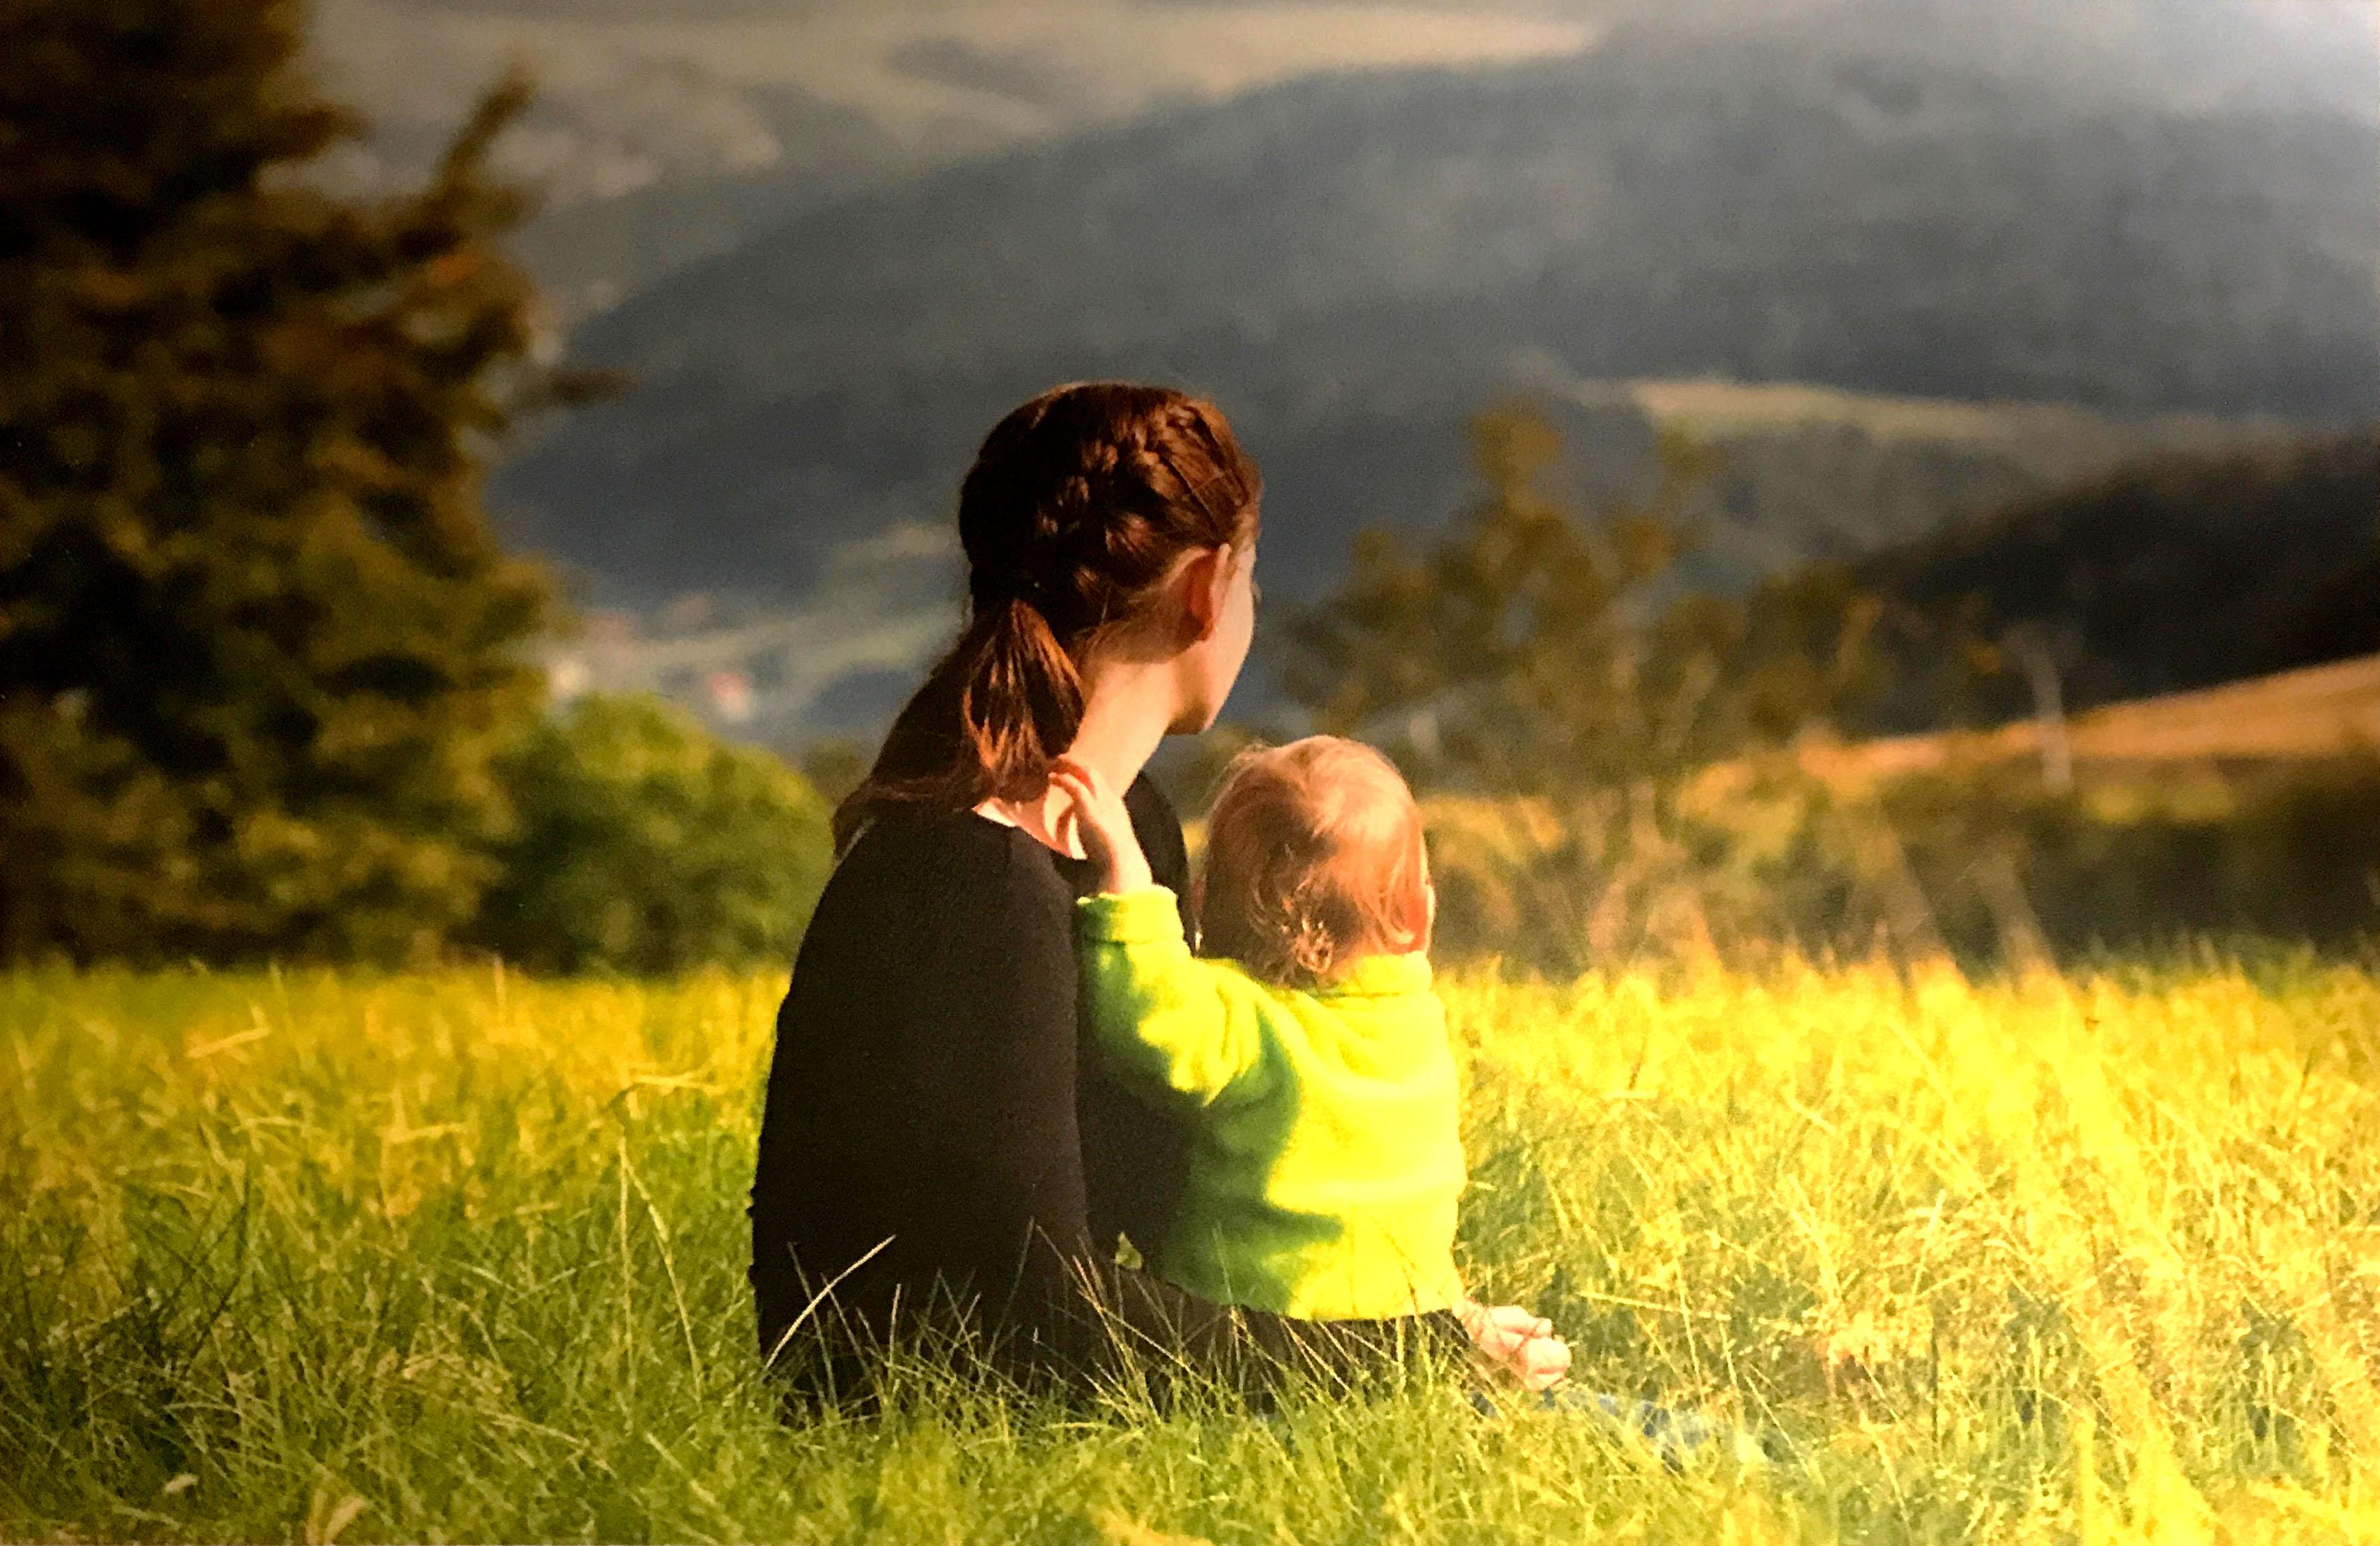 State, Foundation Prioritizing Pregnant Women's Mental Health